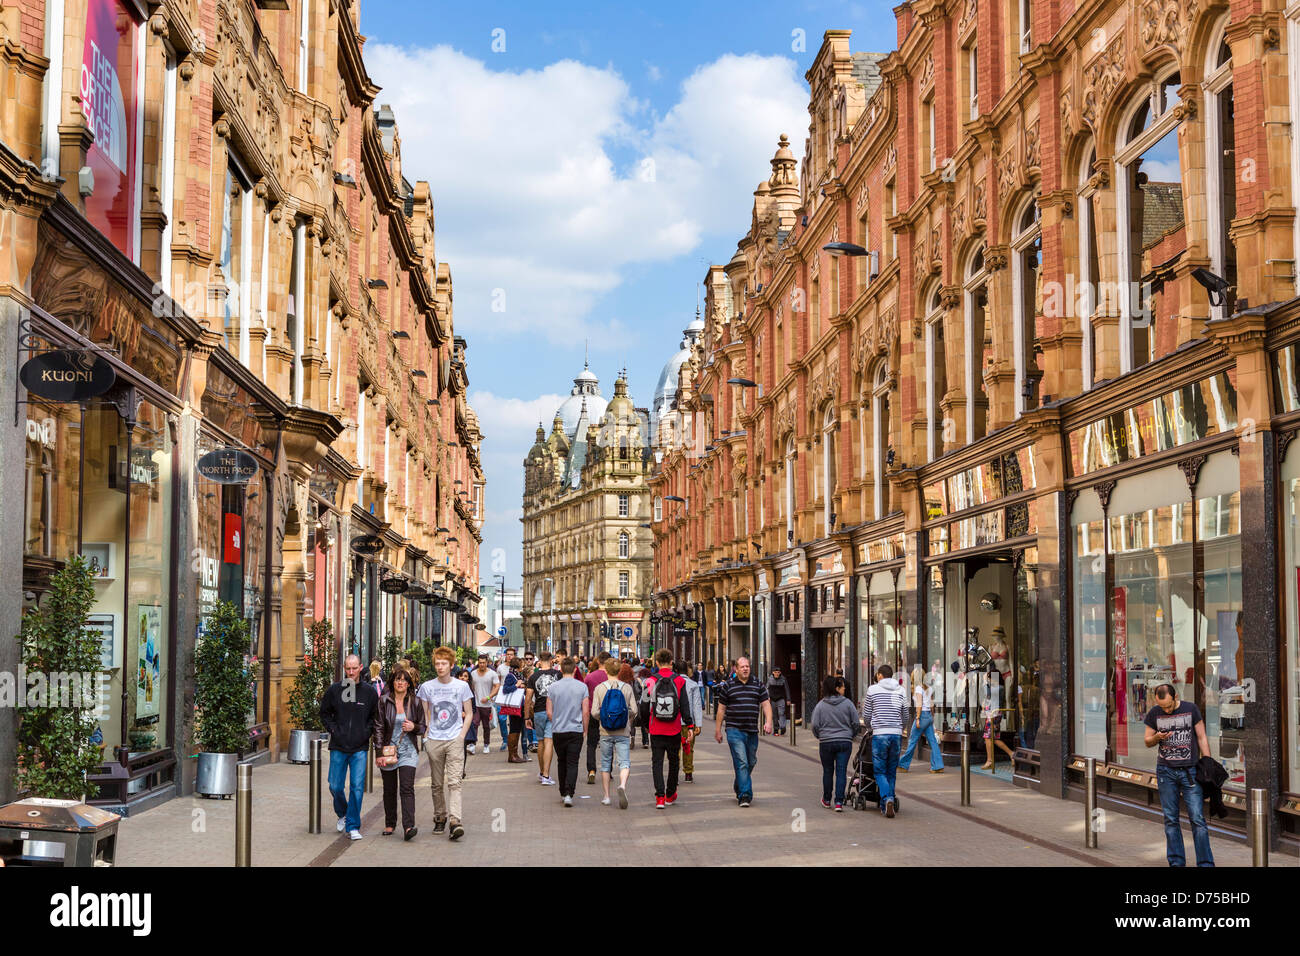 Shops on historic King Edward Street in the Victoria Quarter, Leeds, West Yorkshire, UK - Stock Image